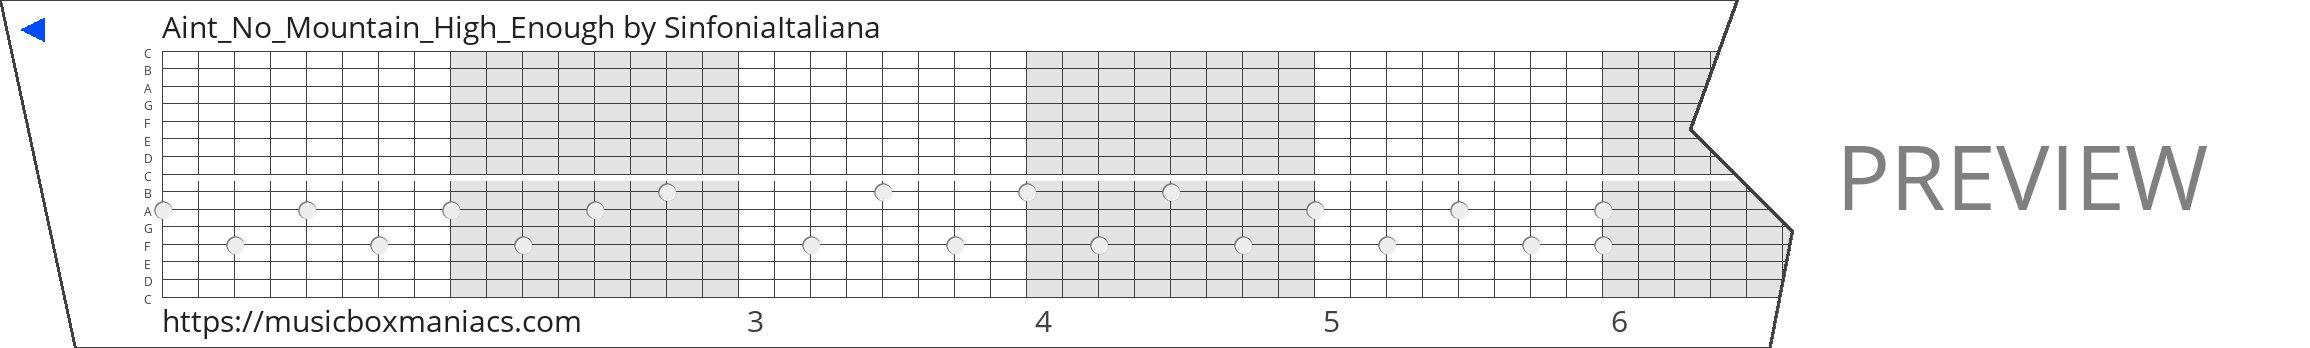 Aint_No_Mountain_High_Enough 15 note music box paper strip